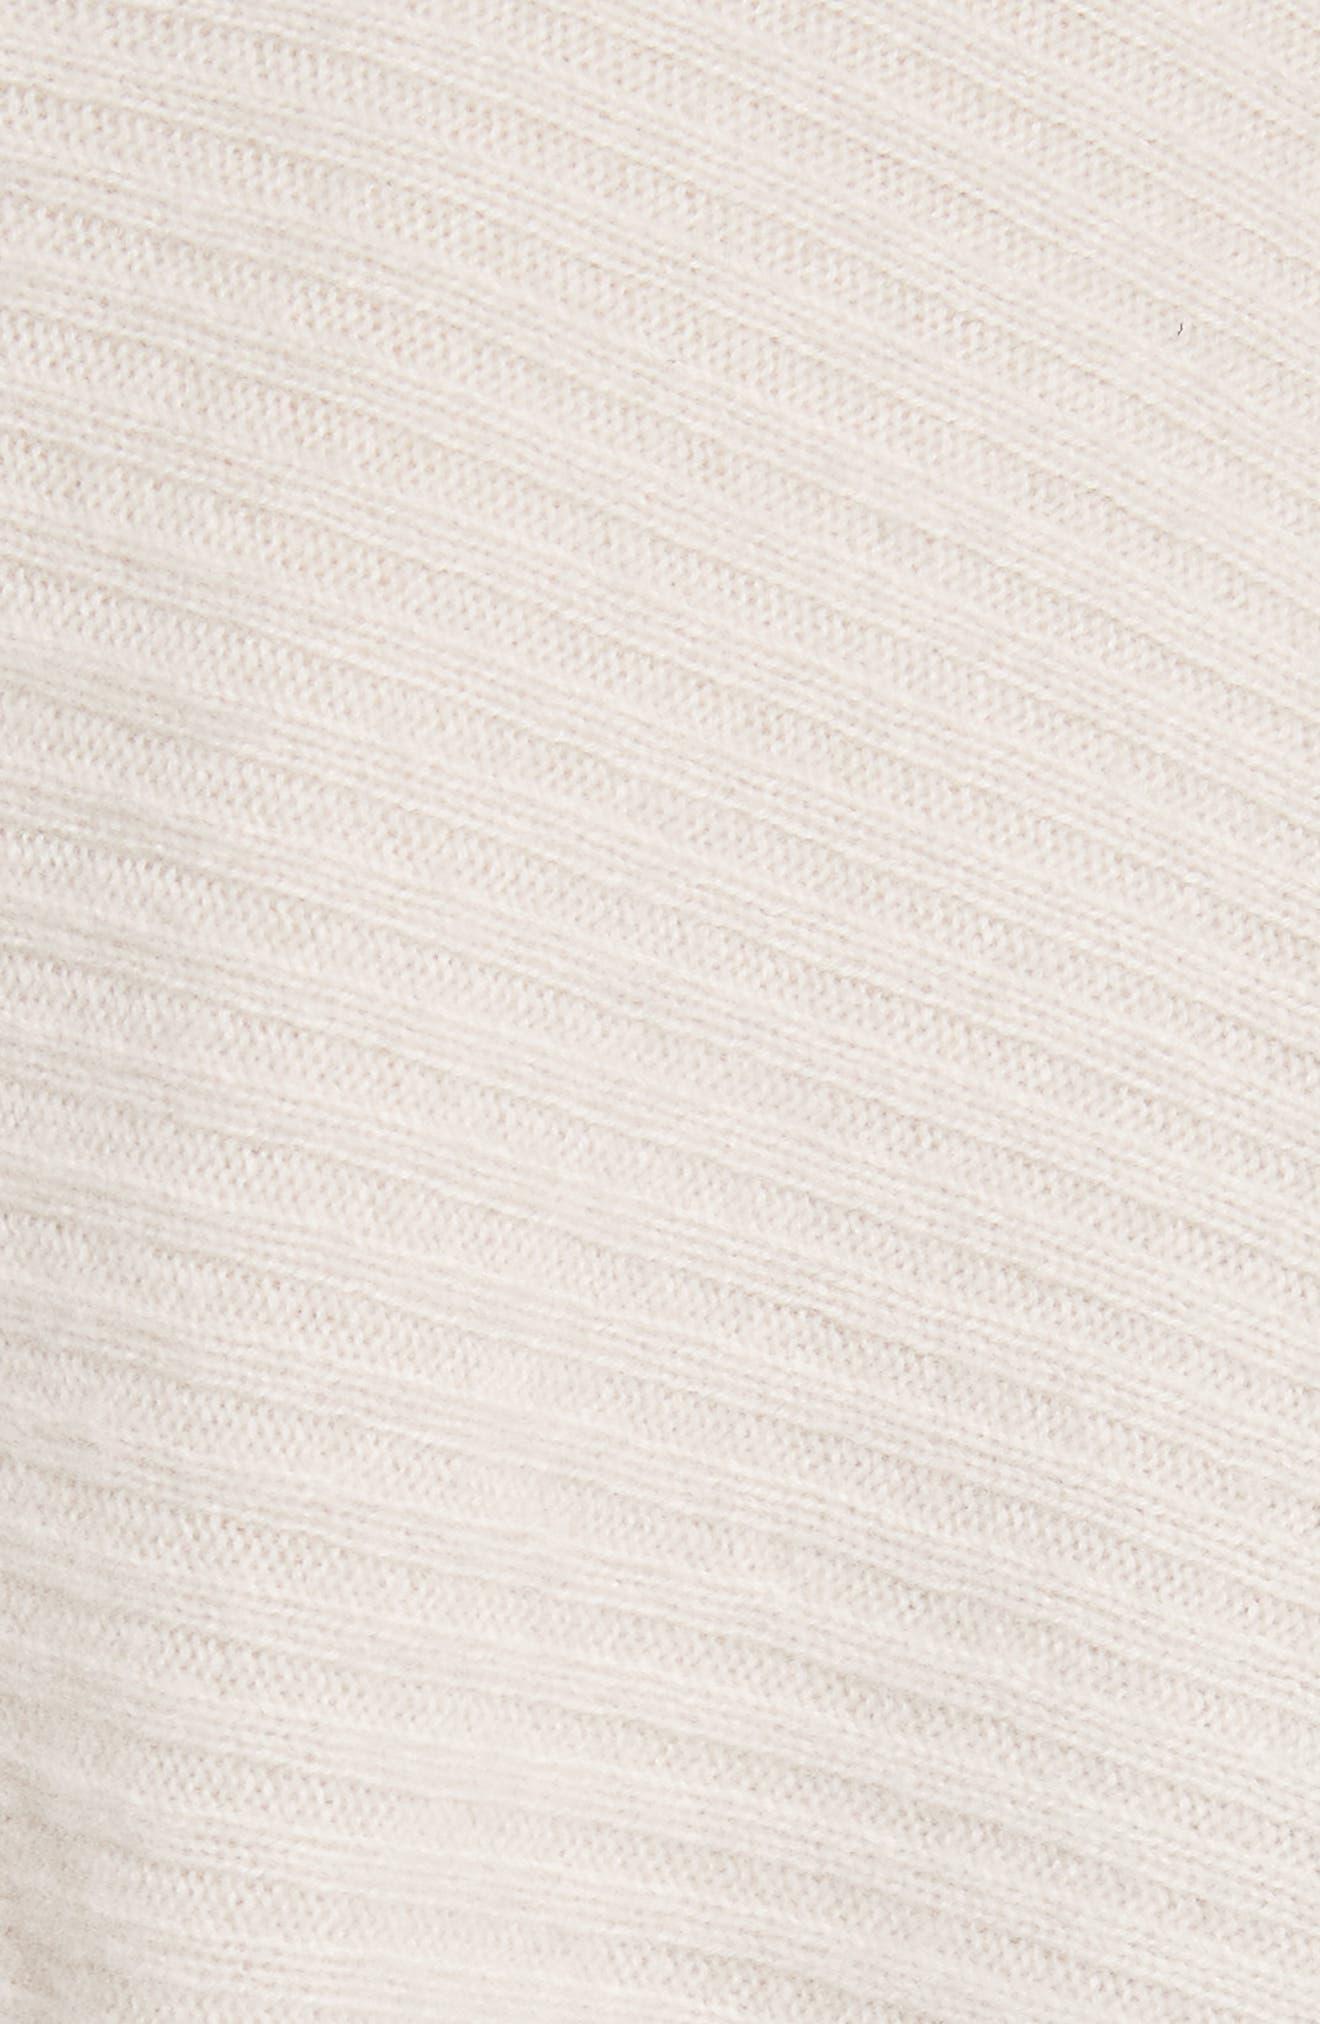 Wool Blend Raglan V-Neck Sweater,                             Alternate thumbnail 14, color,